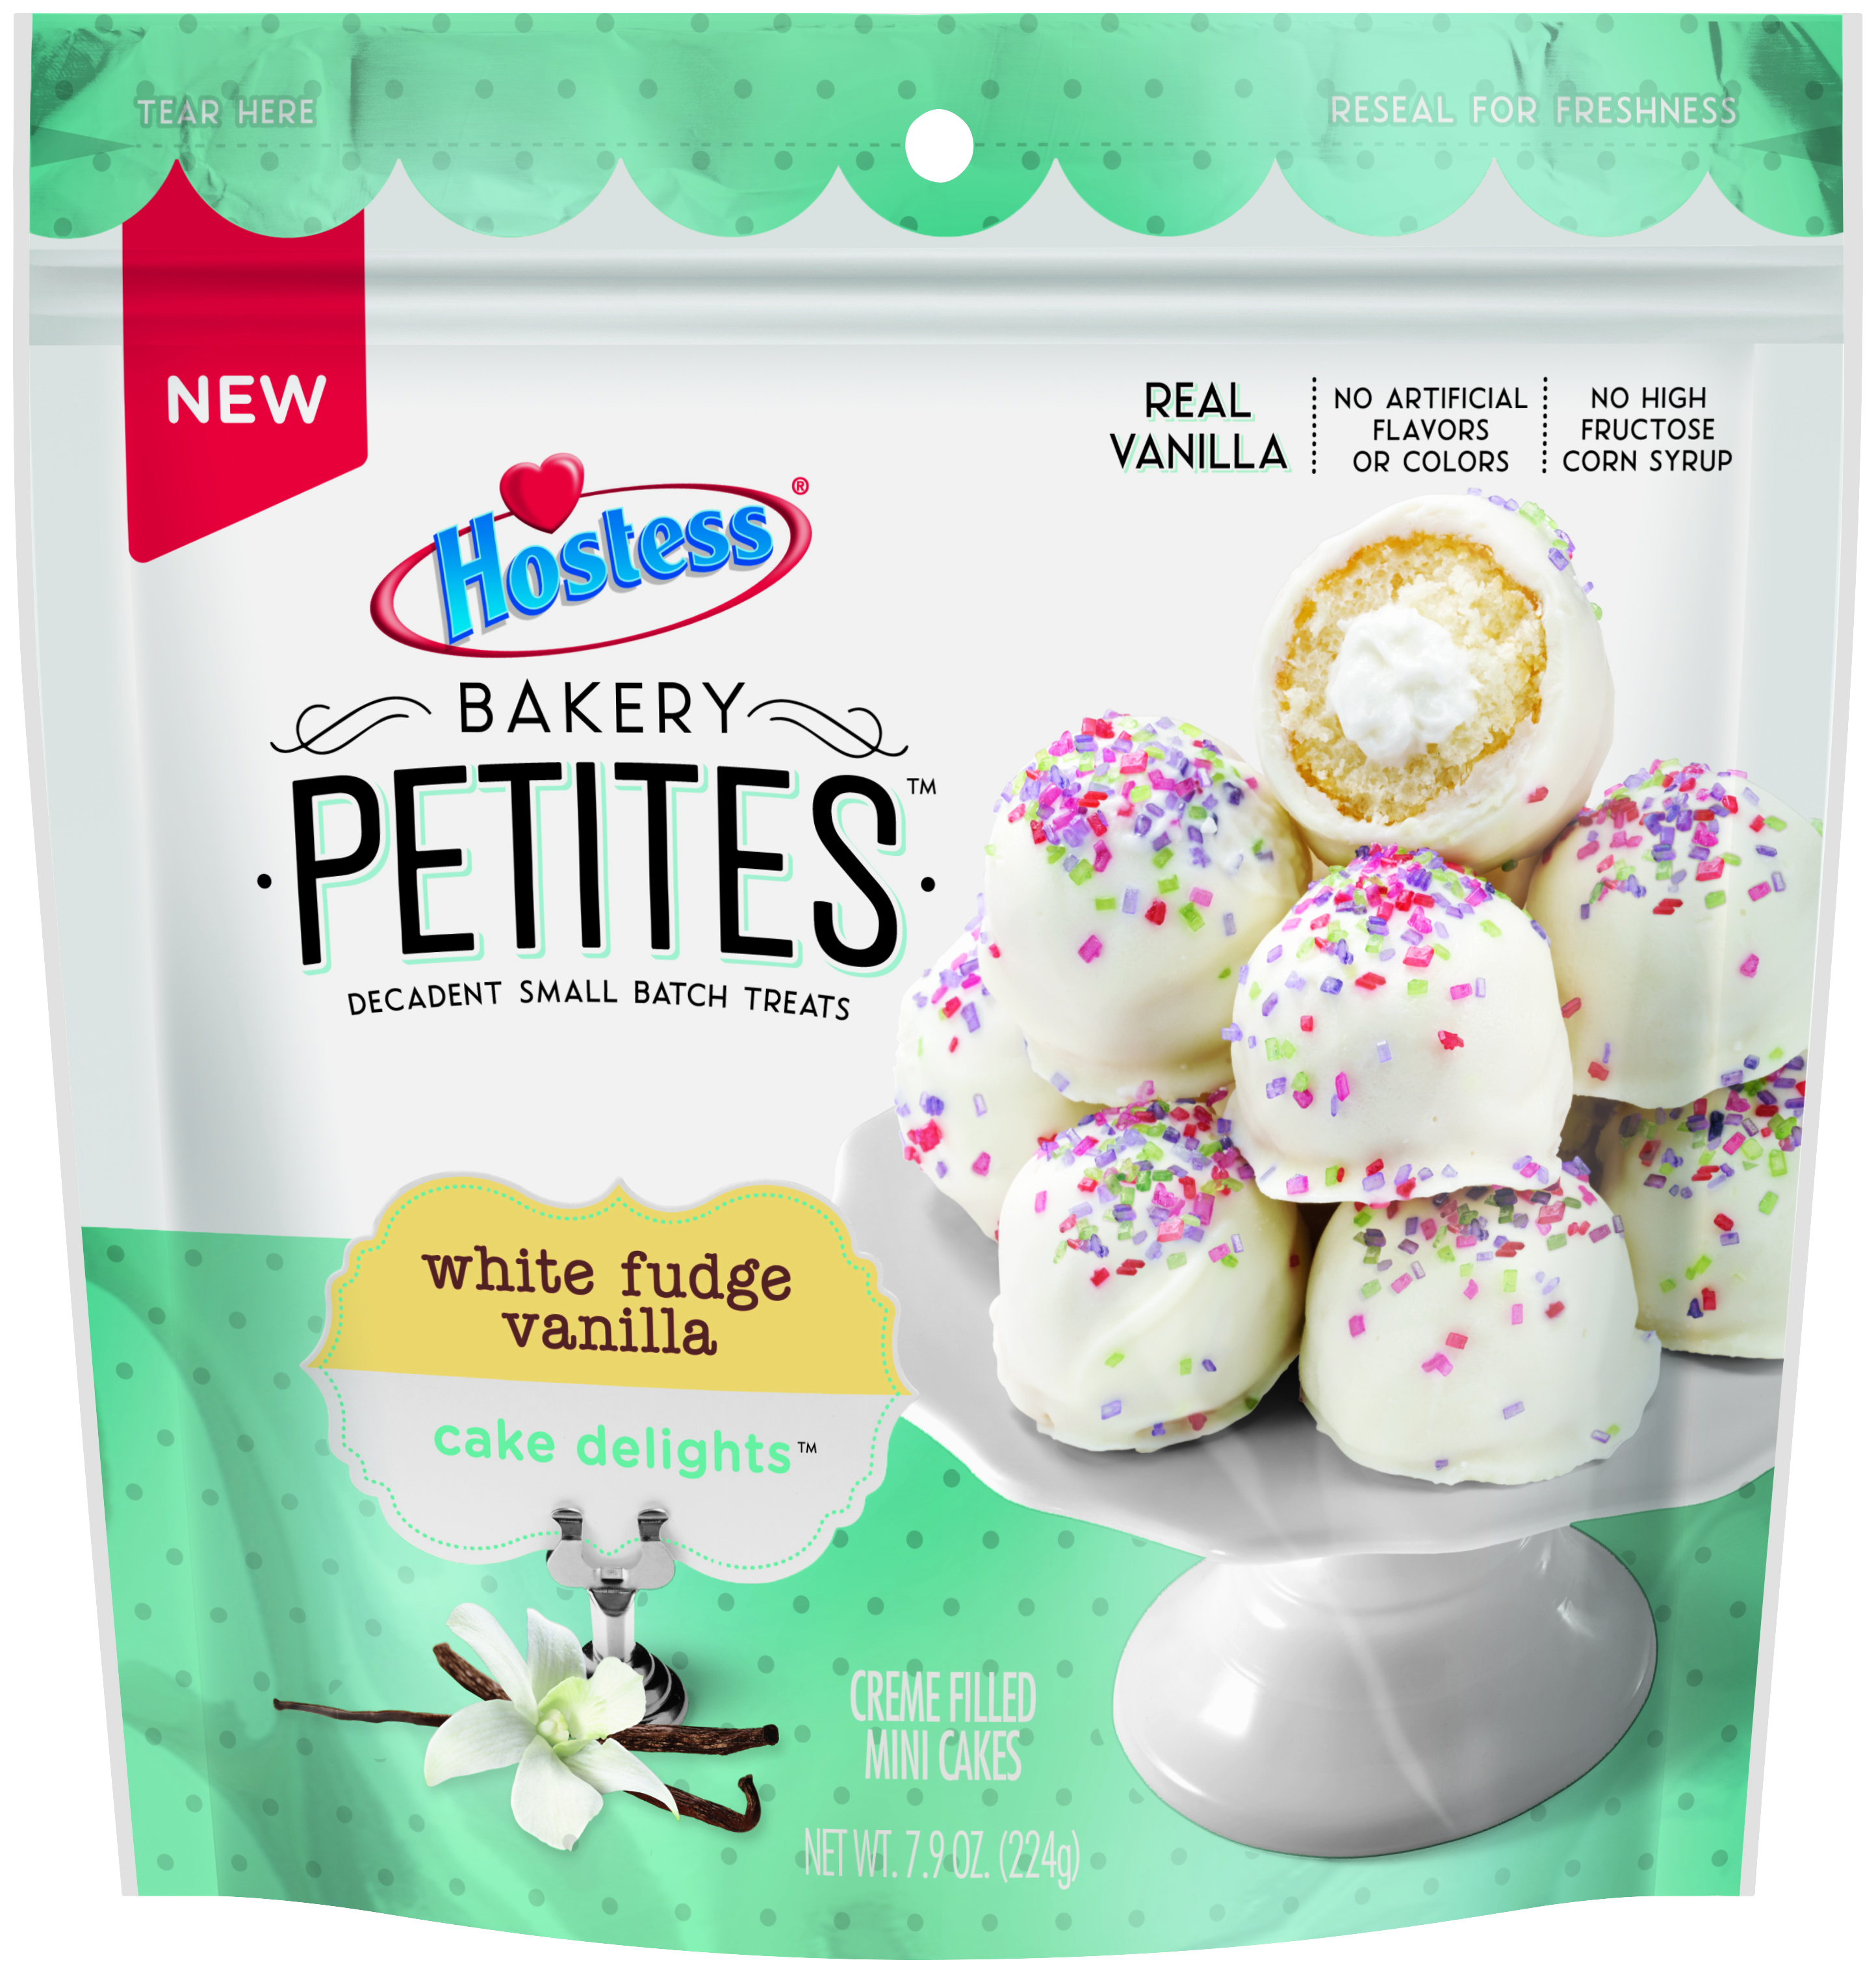 Hostess Bakery Petites White Fudge Vanilla Cake Delights, 7.9 oz